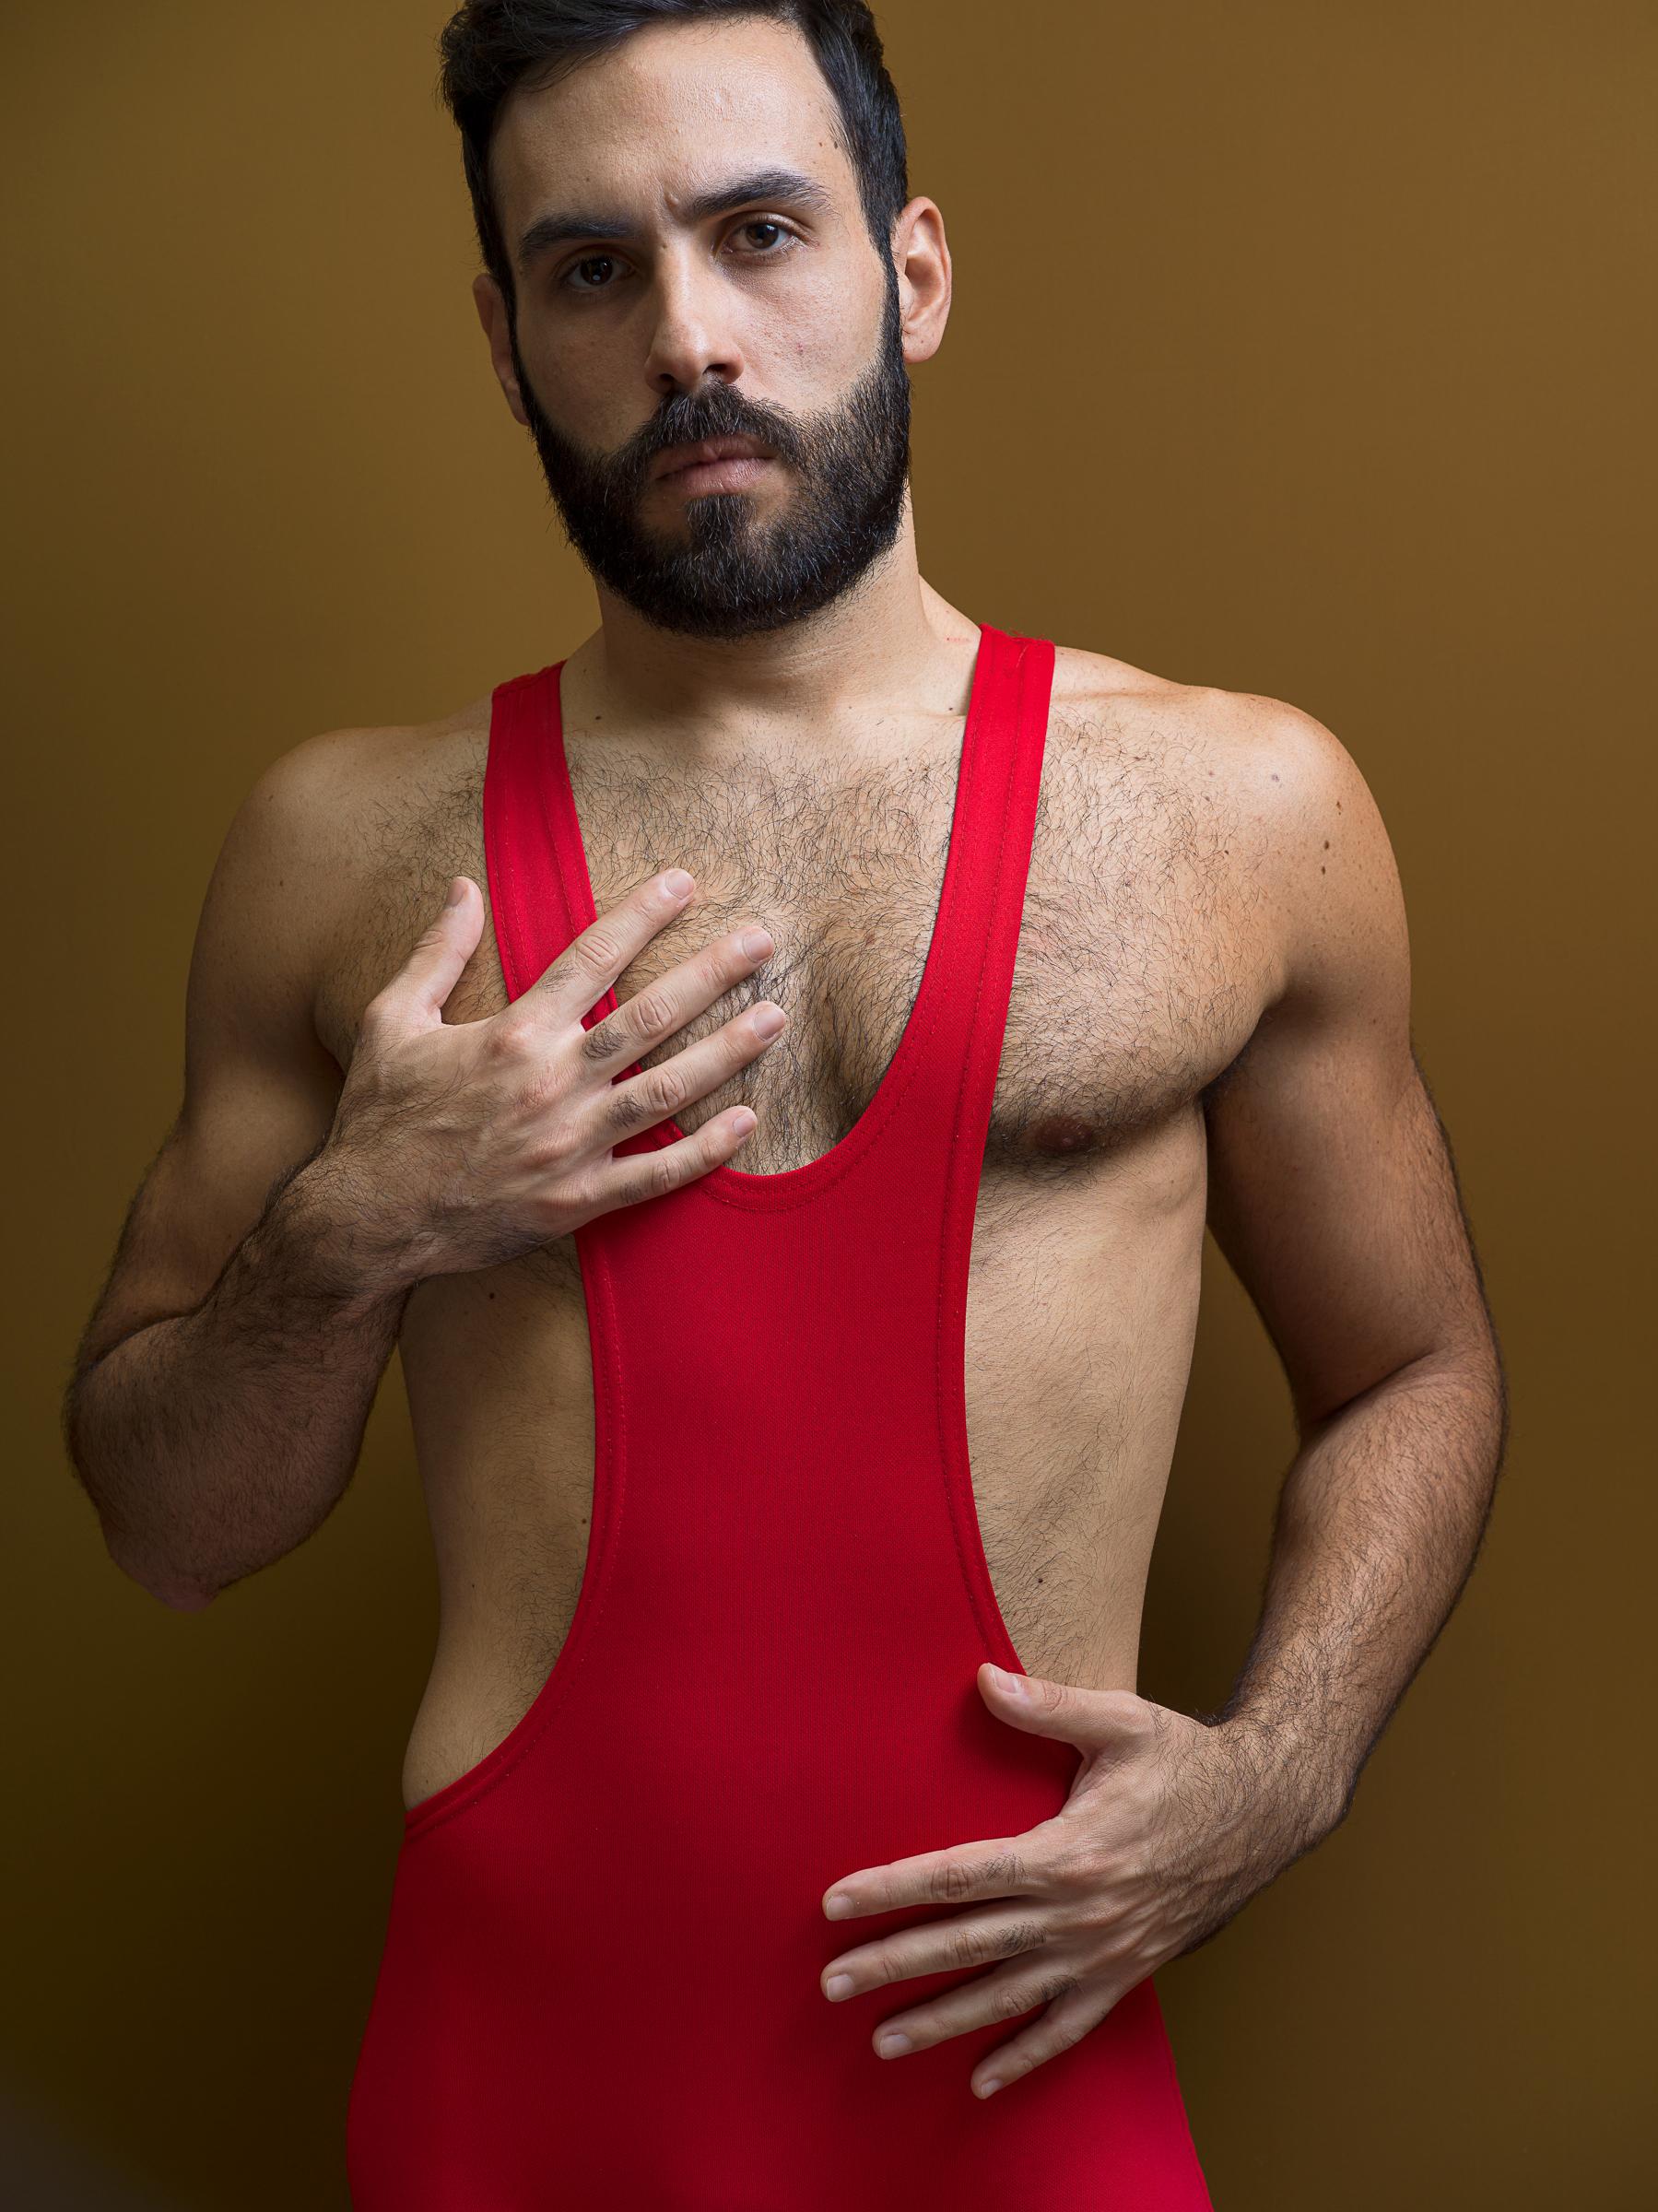 ntimate Strangers, Gabriele Red Wrestling Singlet